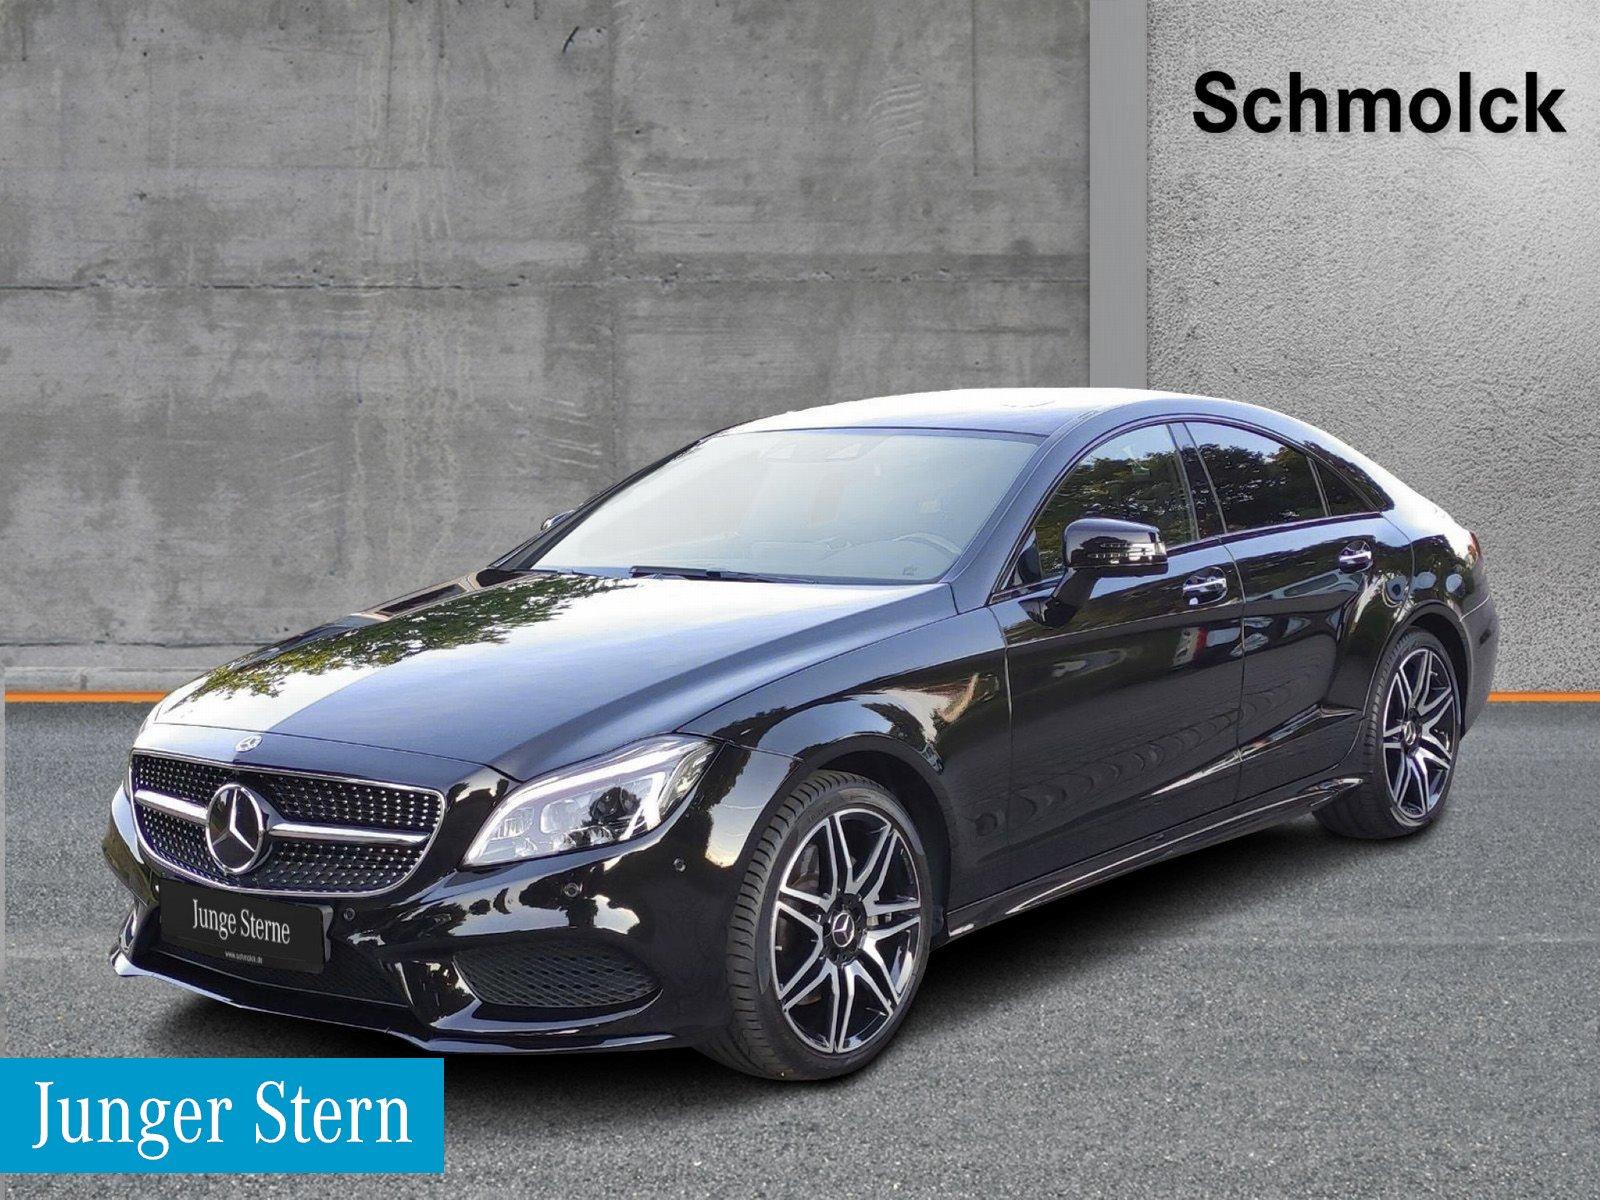 Mercedes-Benz CLS 350d 4M AMG/NIGHT/360°/LED/COMAND/DSTR/NP99K, Jahr 2017, Diesel